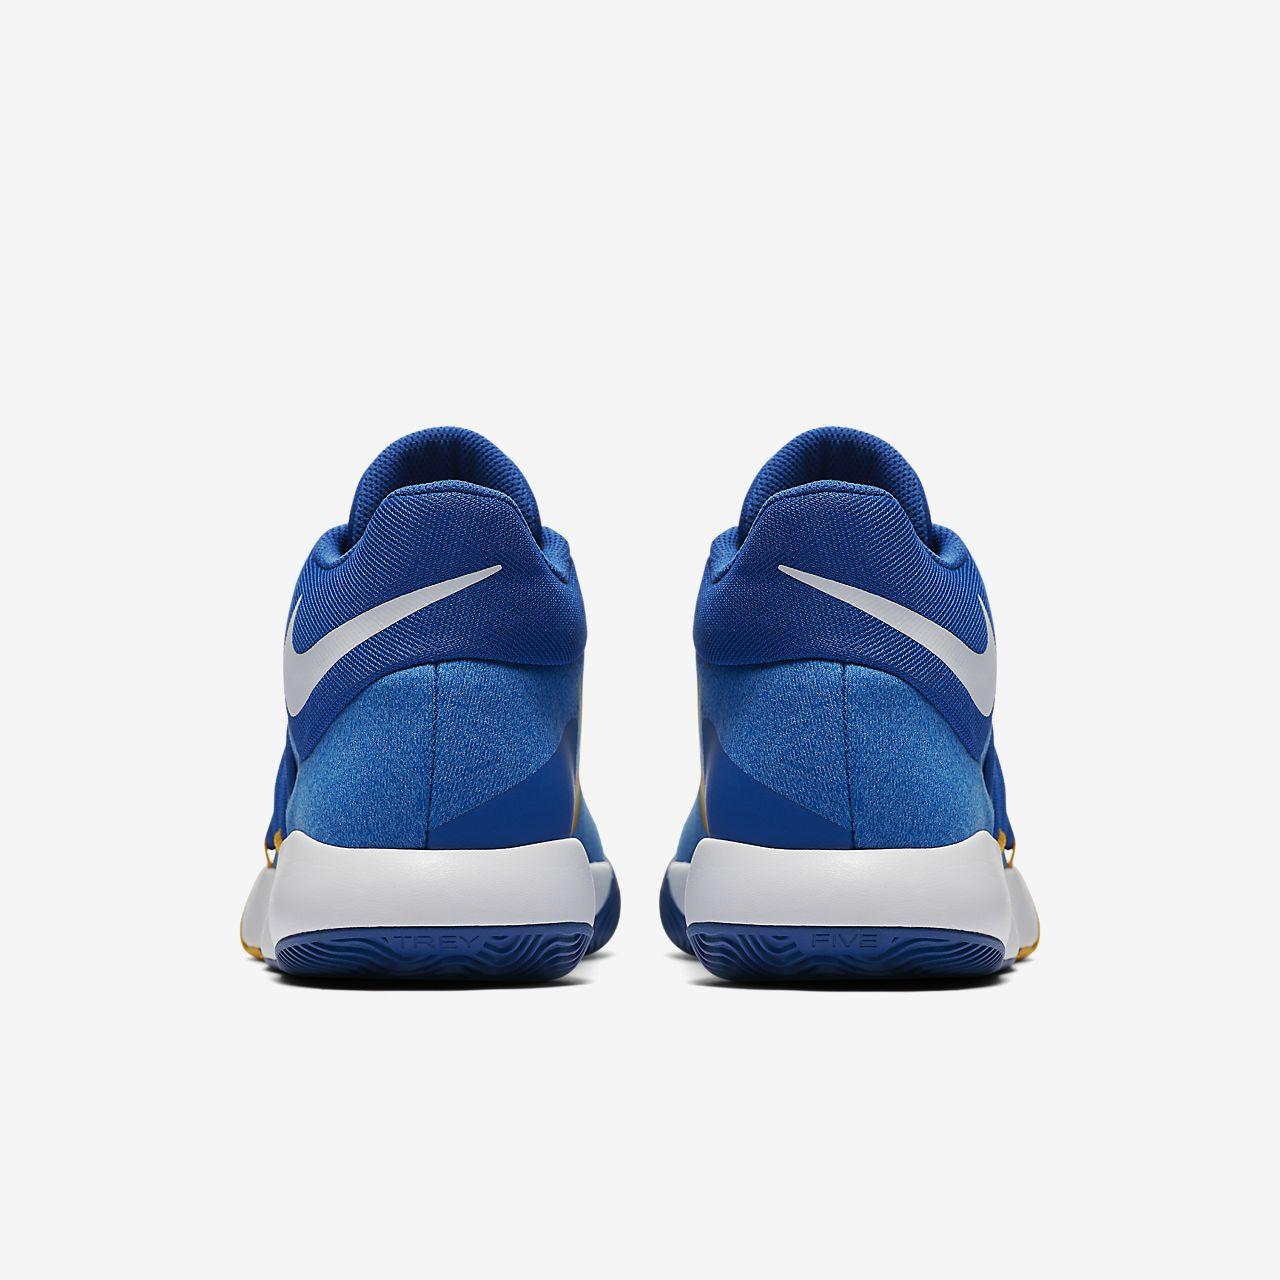 blue kd sneakers lunarlon cushioning